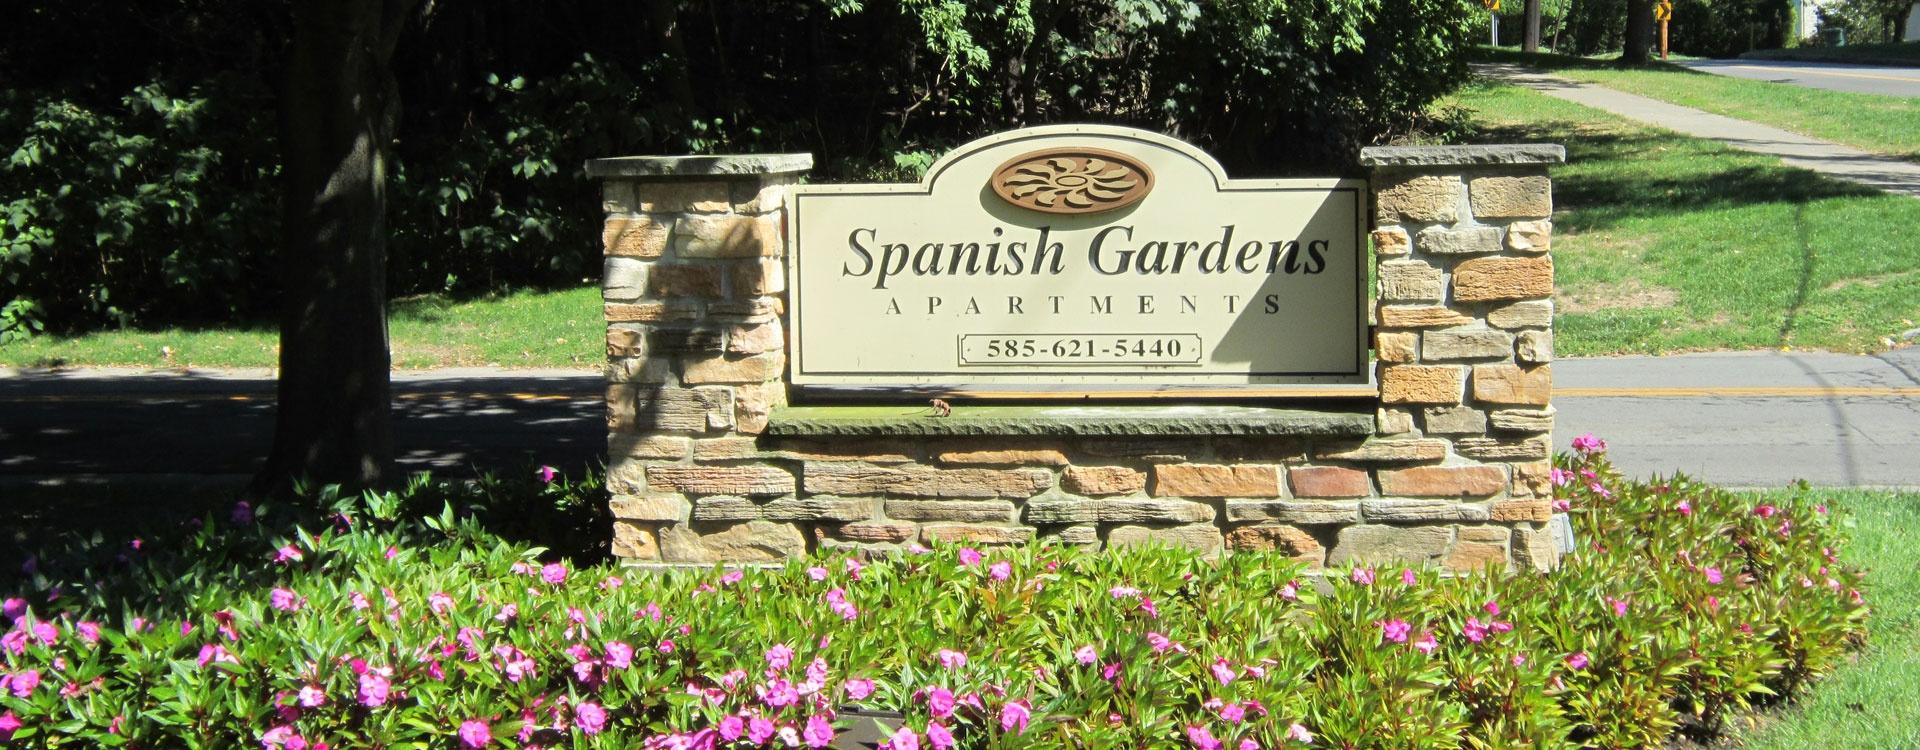 Spanish Gardens Apartments